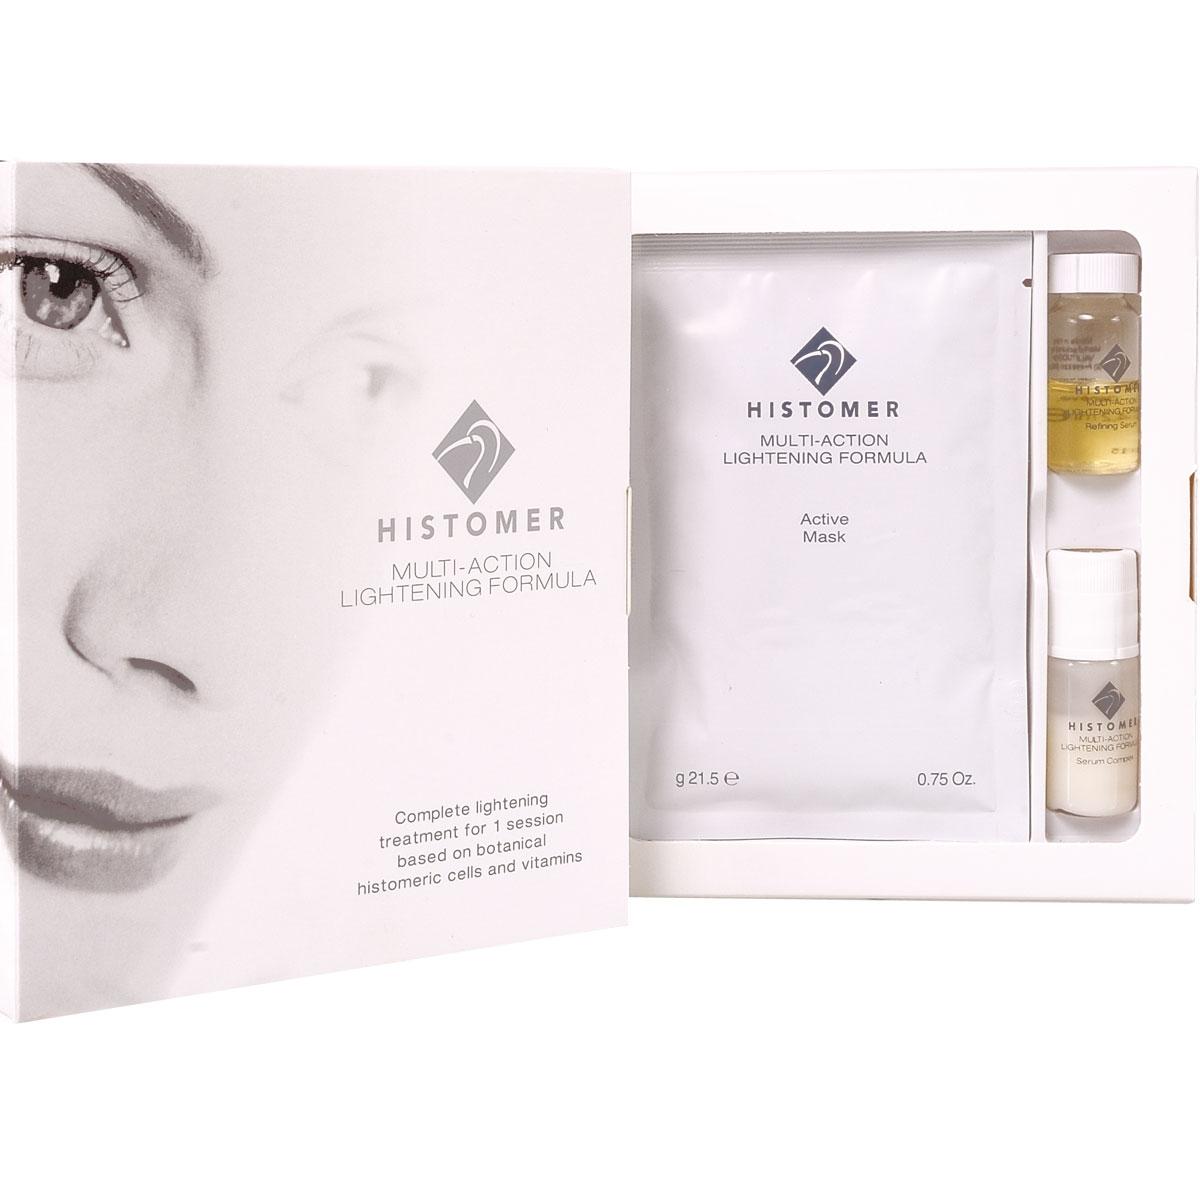 Histomer Промо-Набор Anti-Age Lightening Kit for 1 session для Сияния Кожи